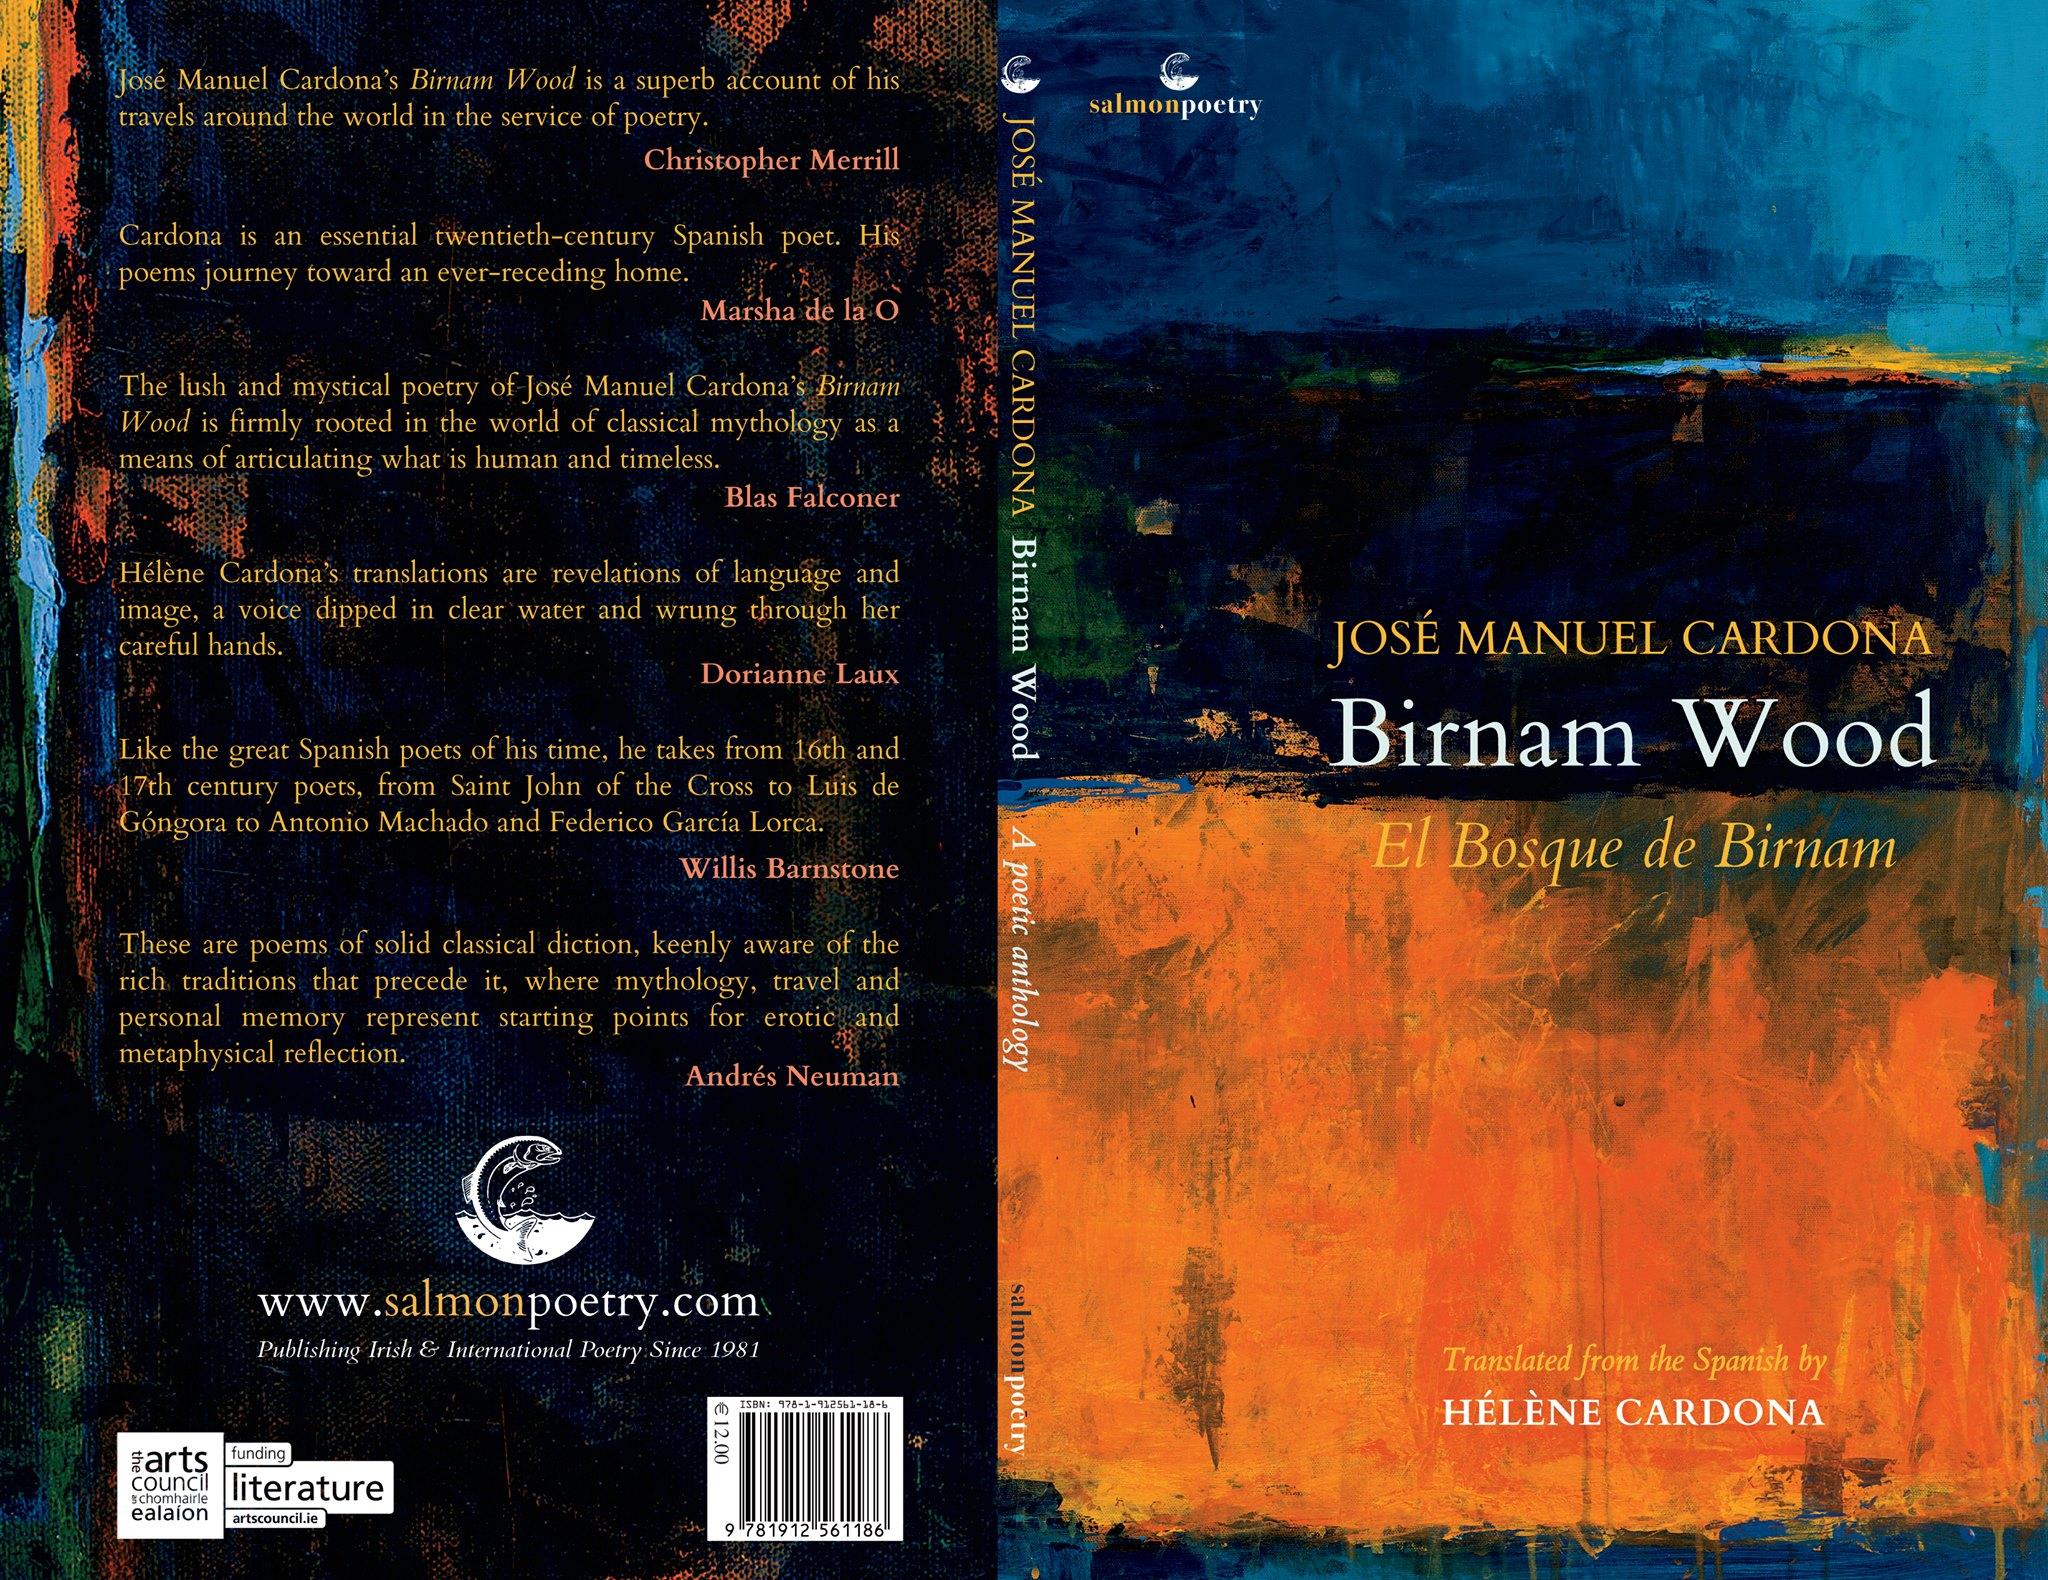 BirnamWood